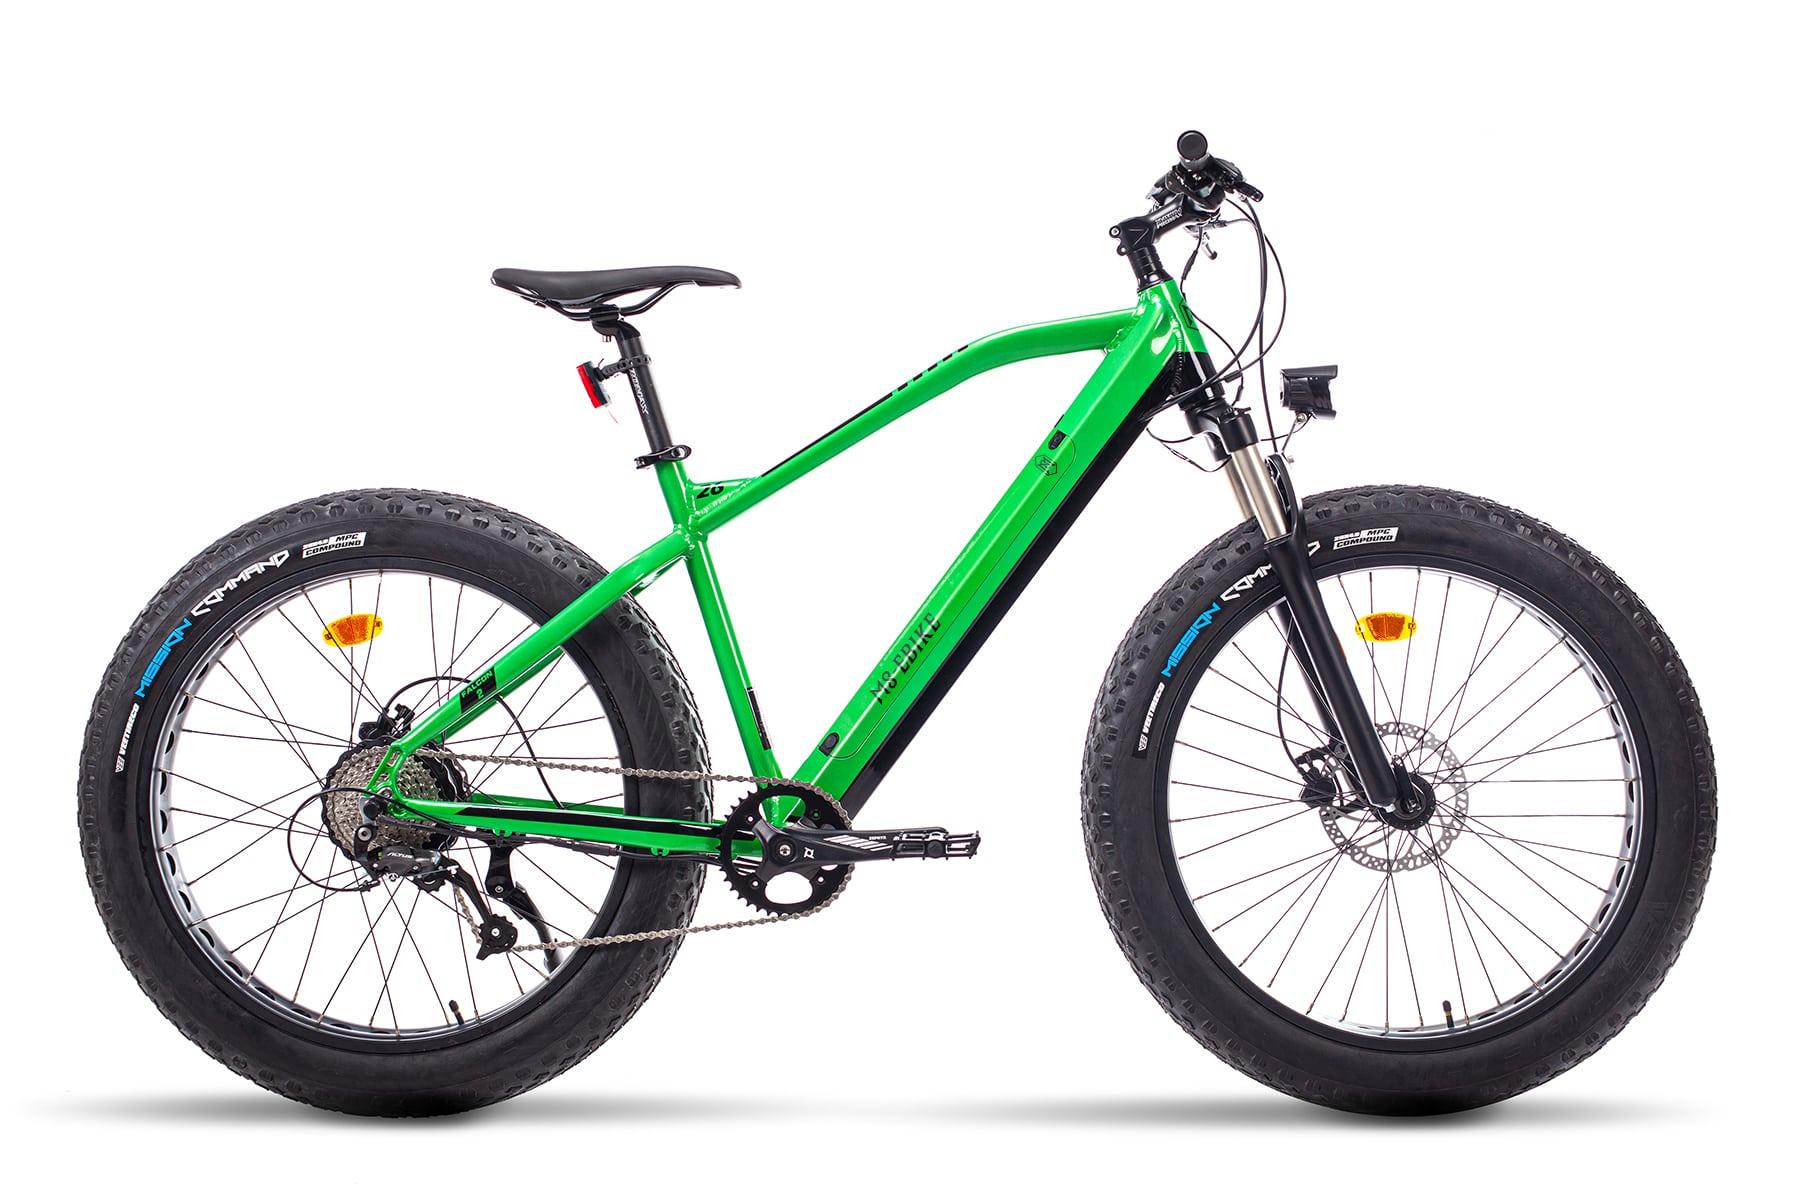 Elektrische Fatbike Mountainbike Falcon groen